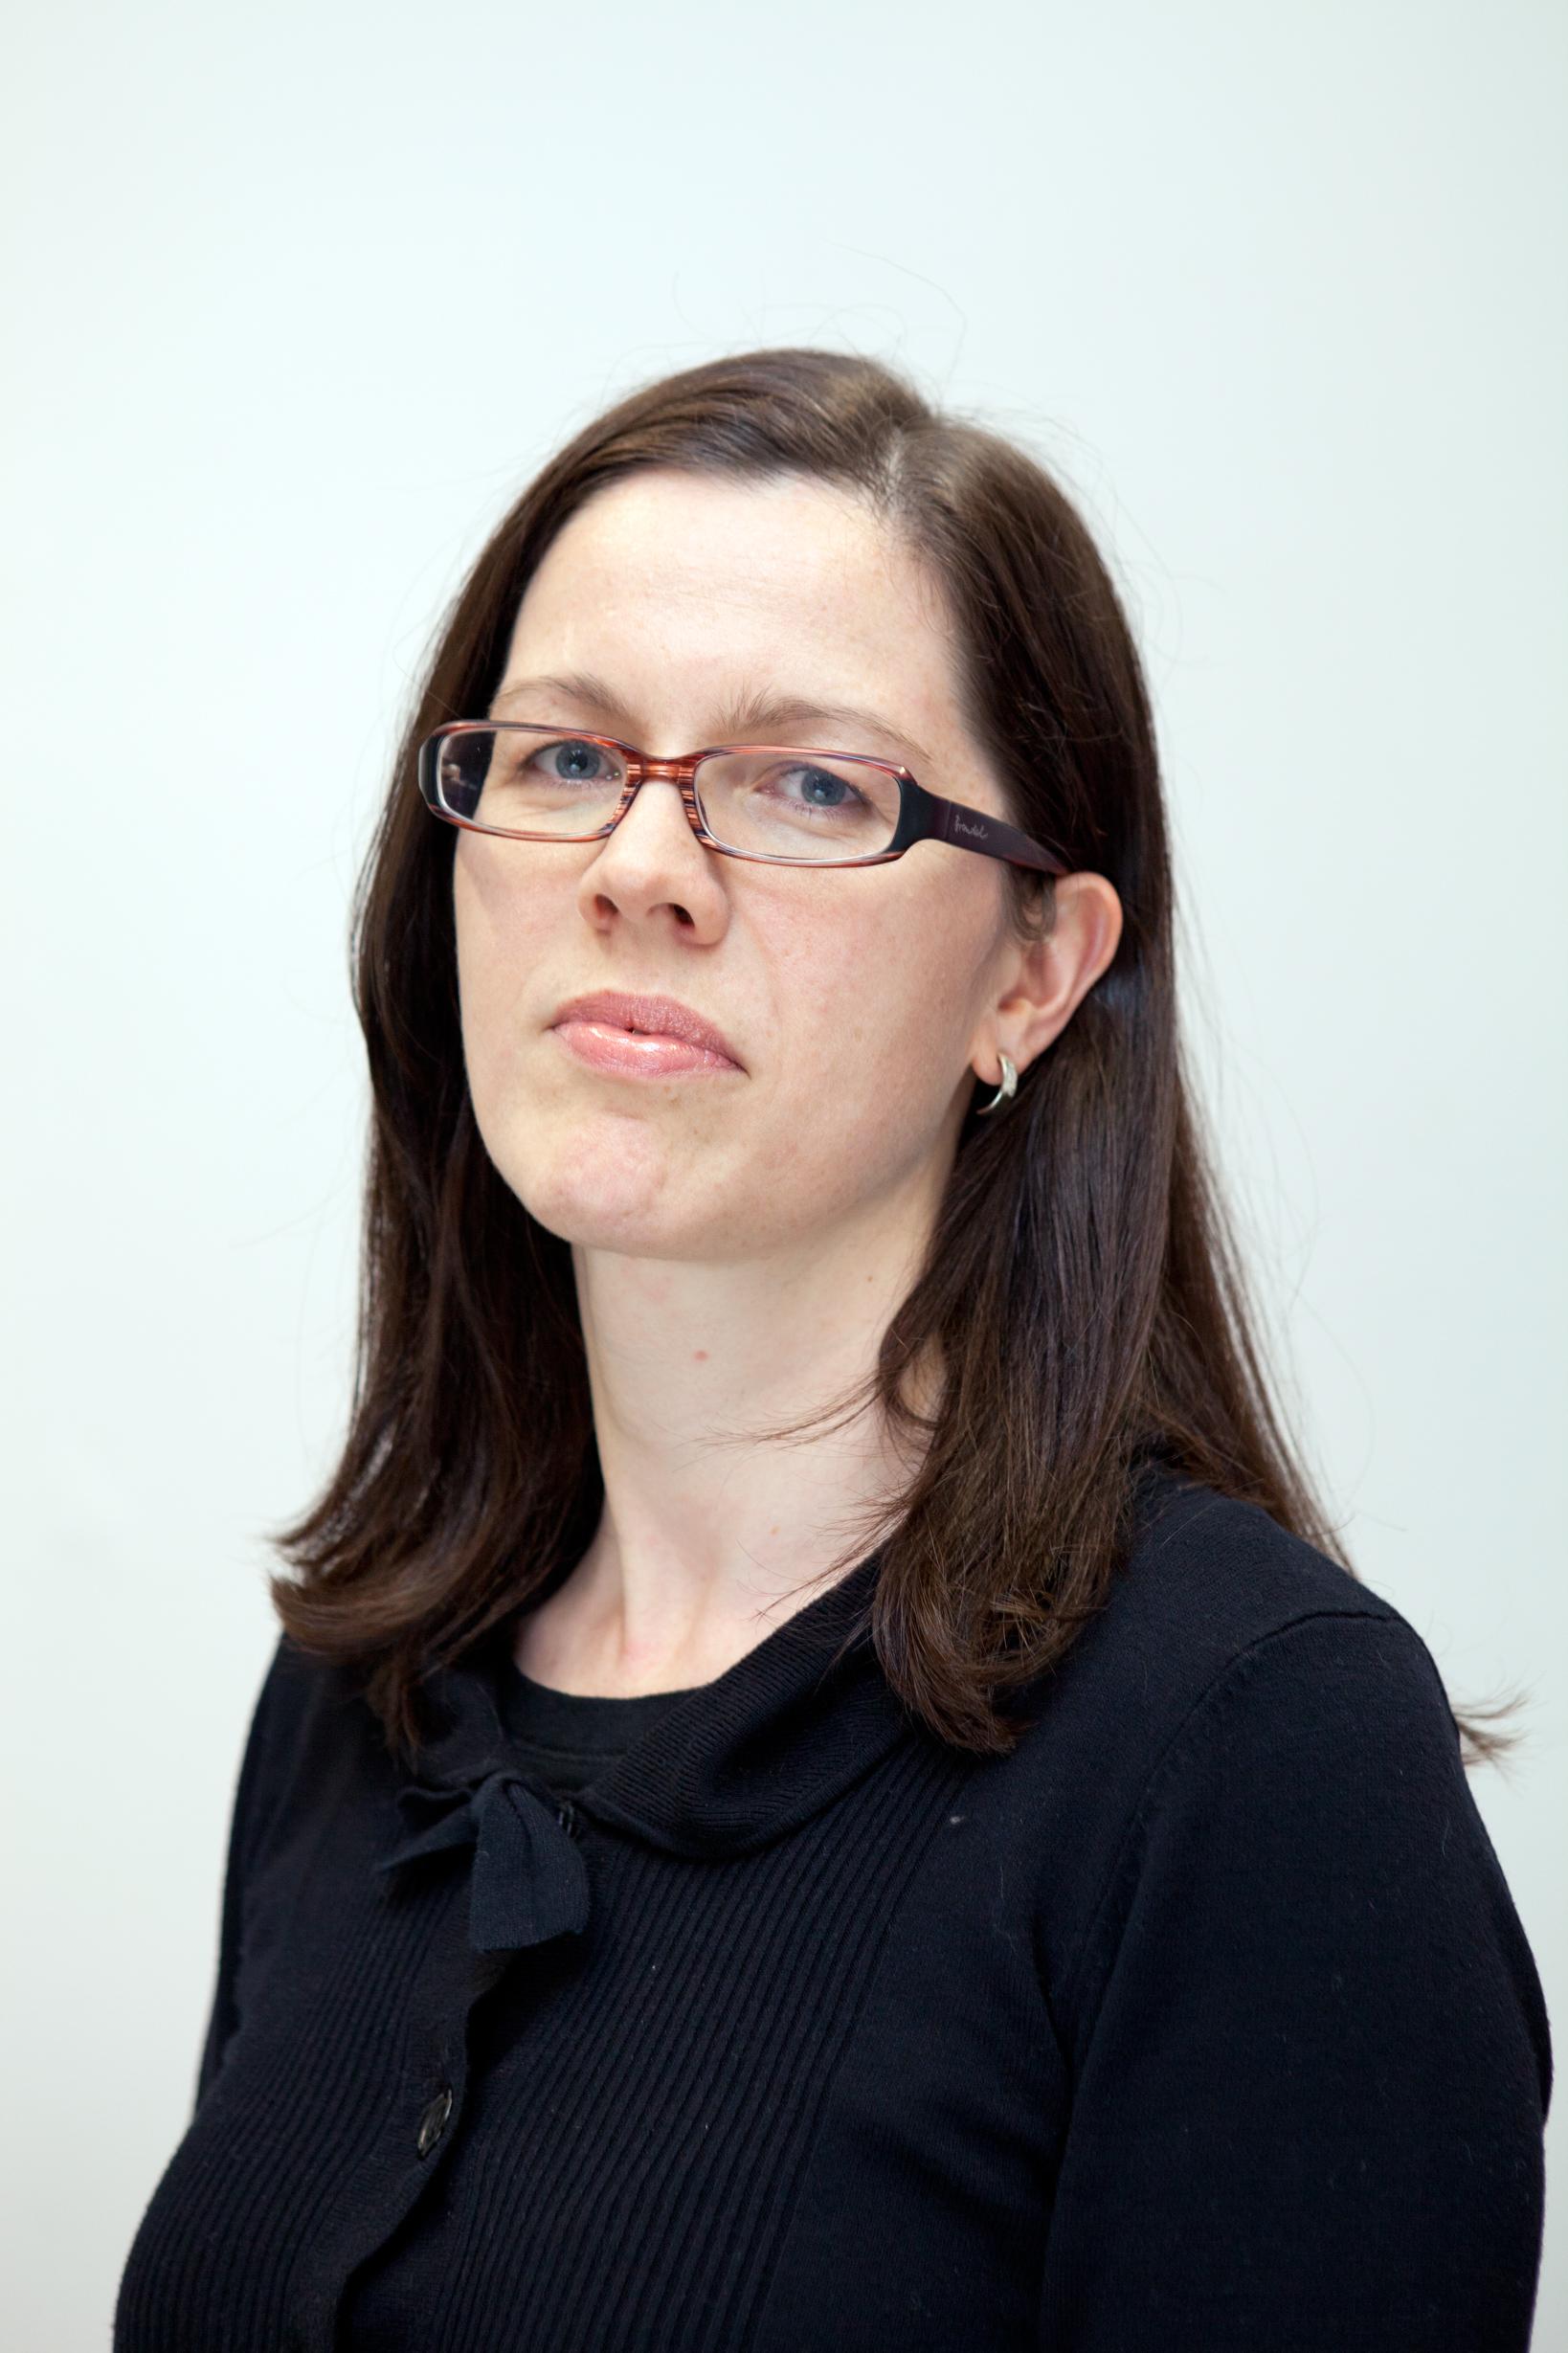 Bernadette Phelan Business in the Community Ireland